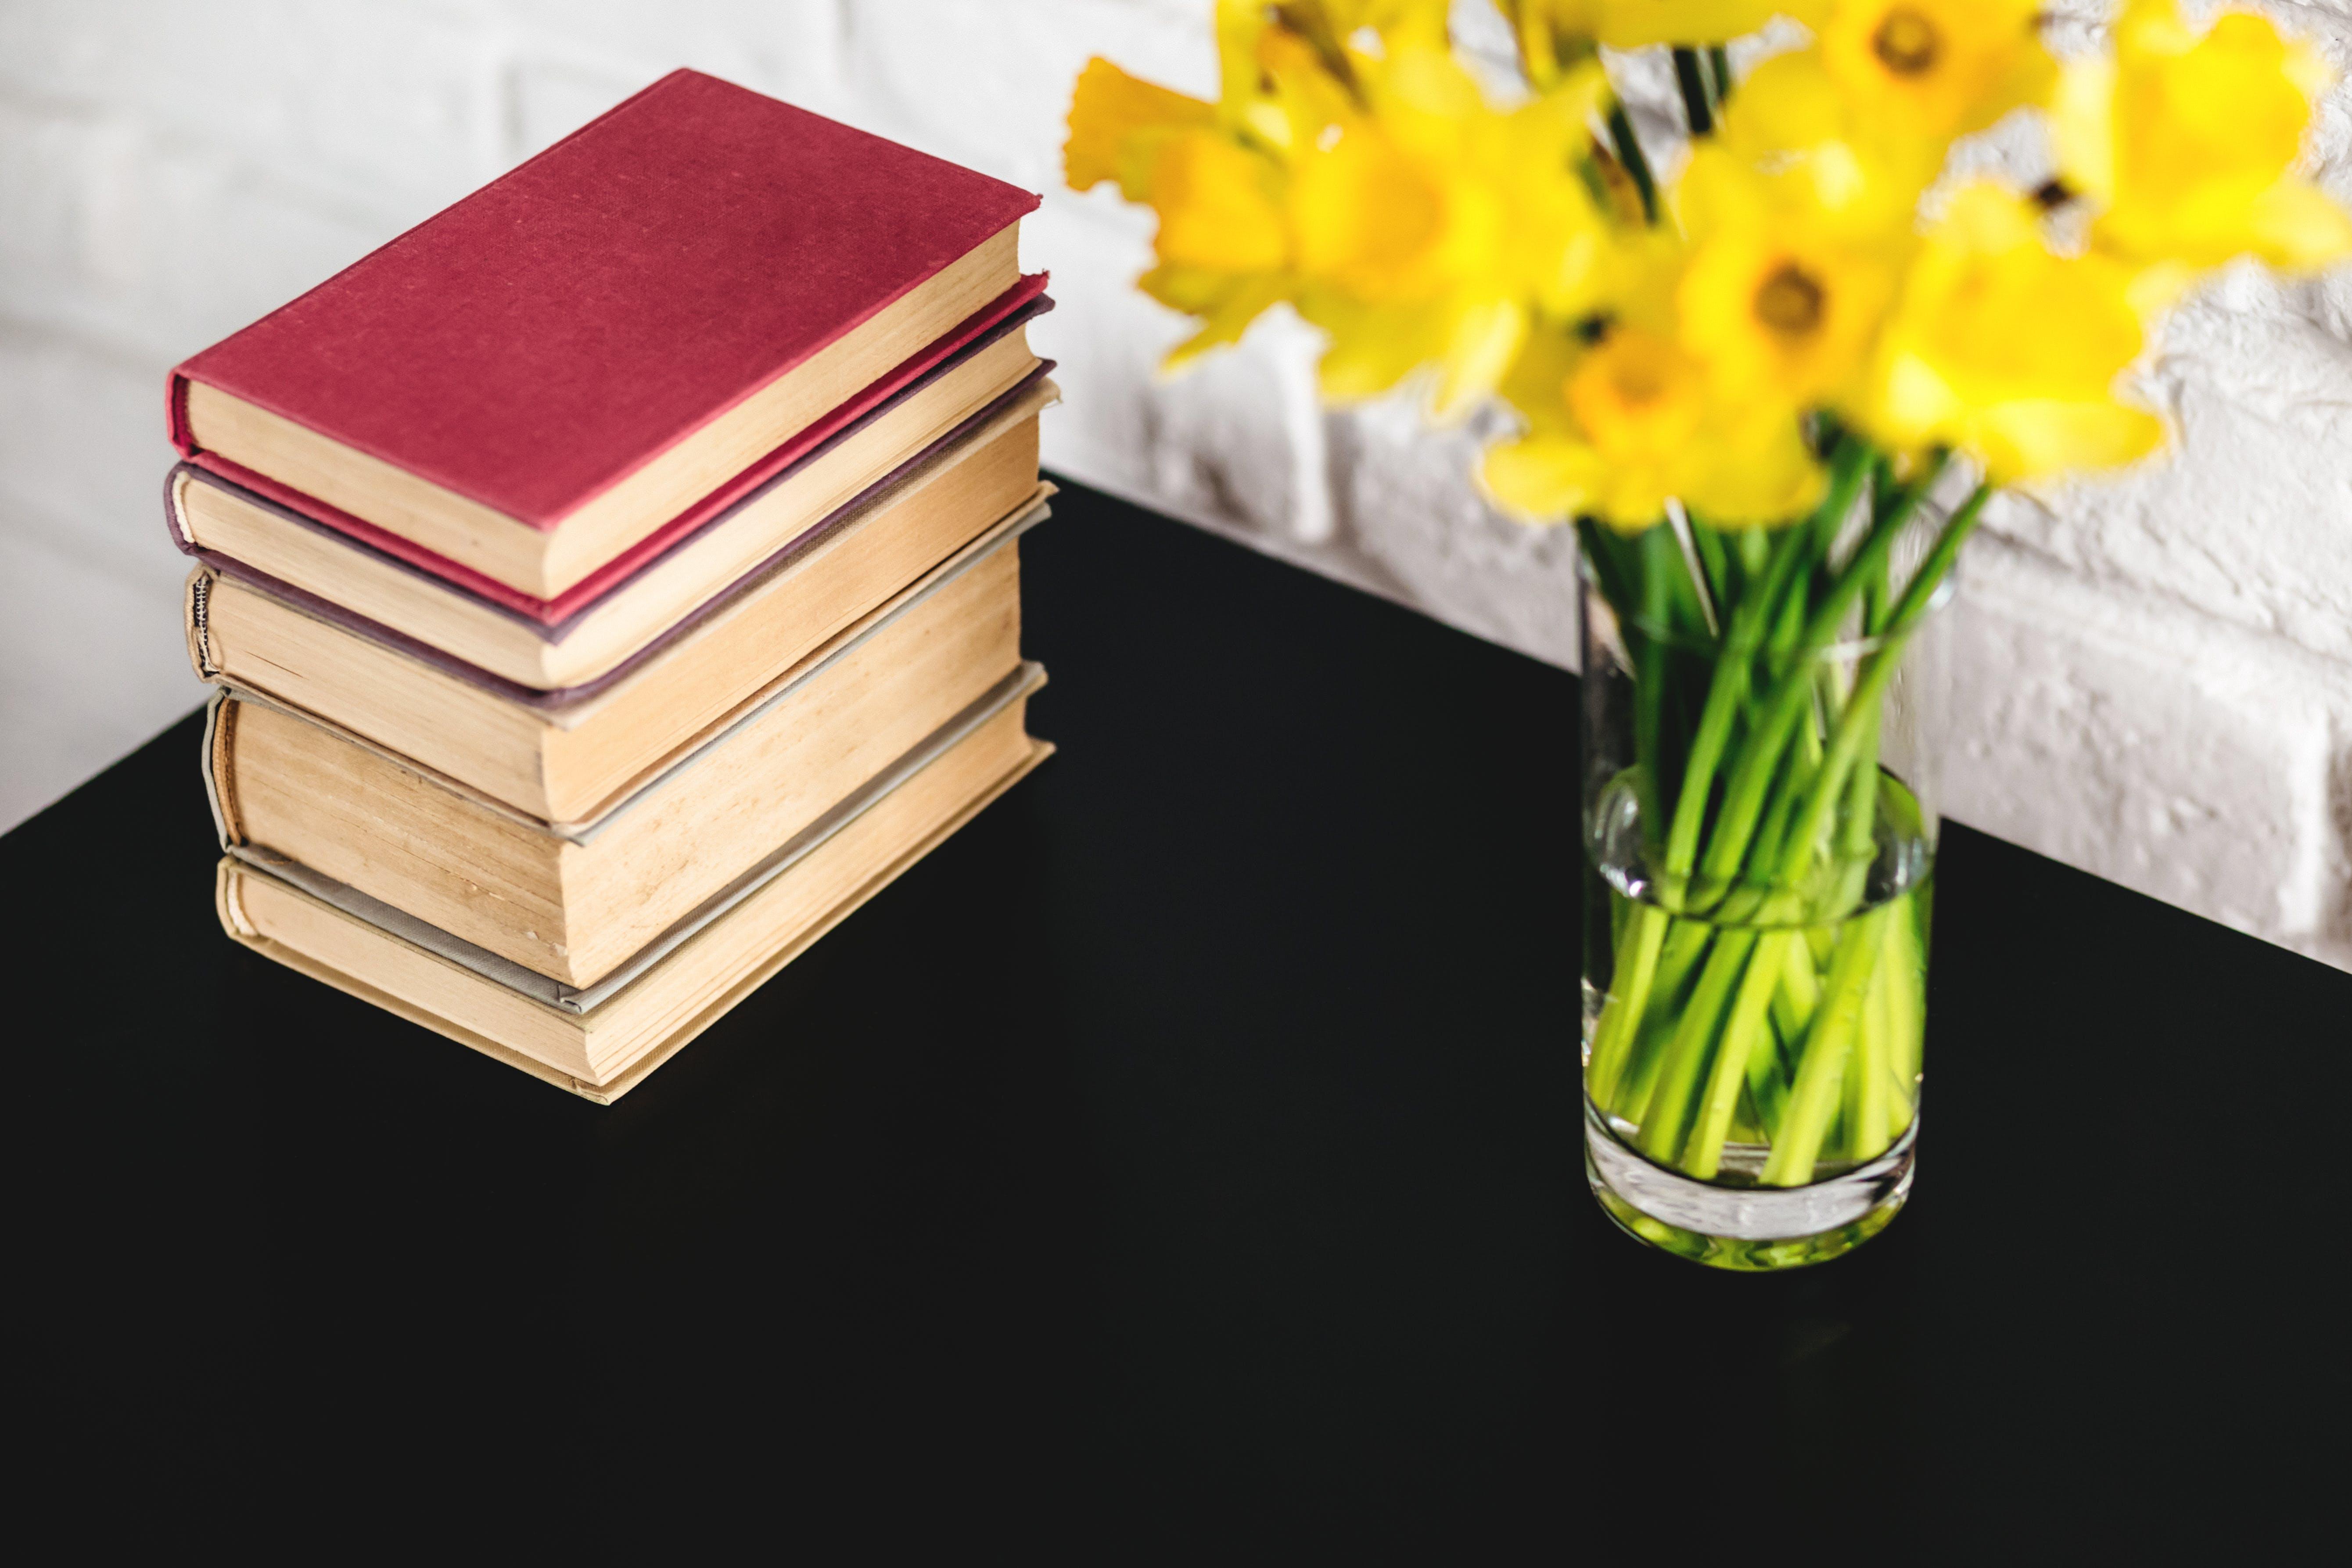 Hardbound Books Beside Yellow Petaled Flowers